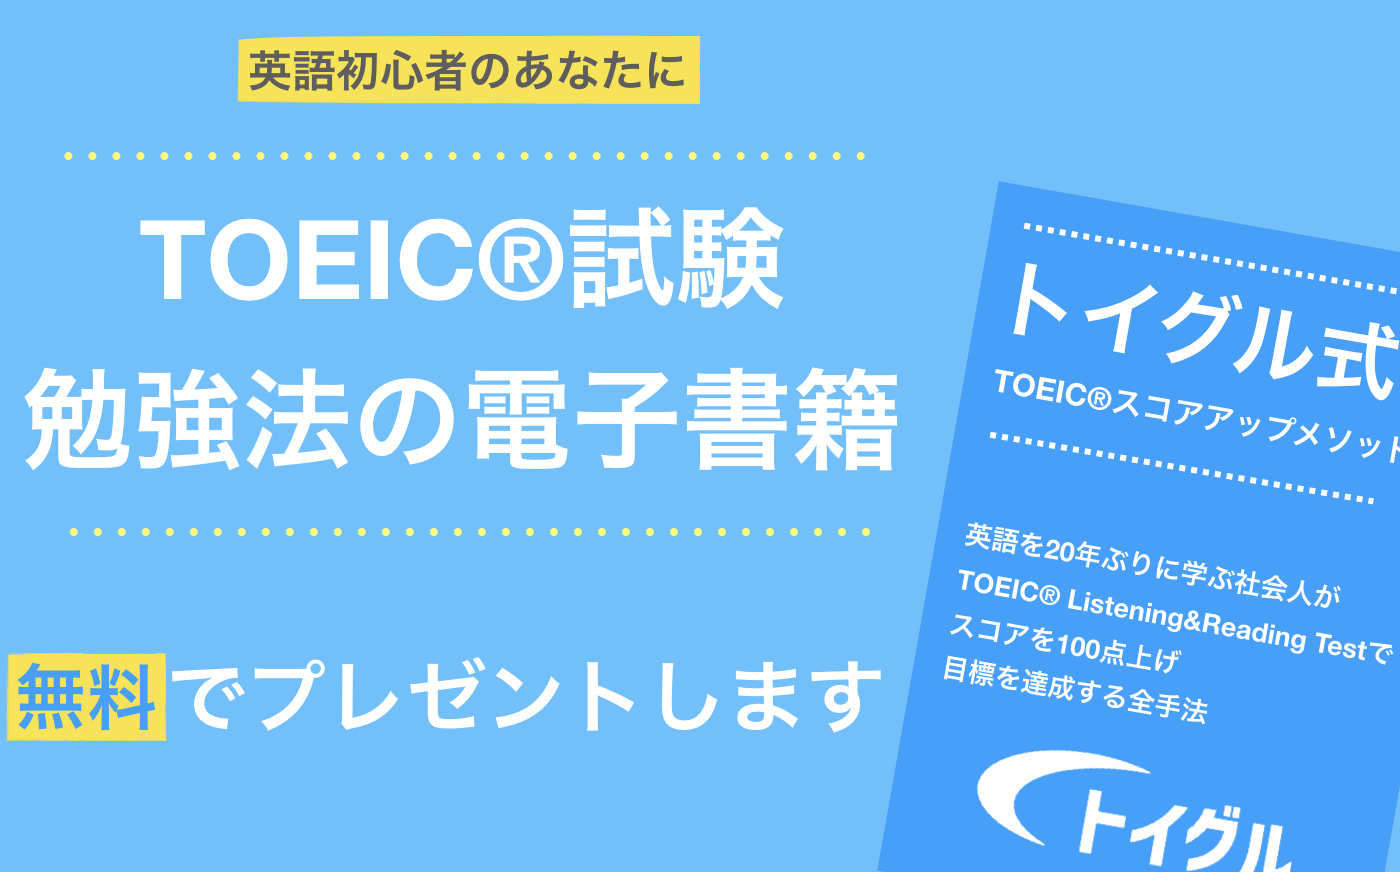 TOEIC試験勉強法の電子書籍